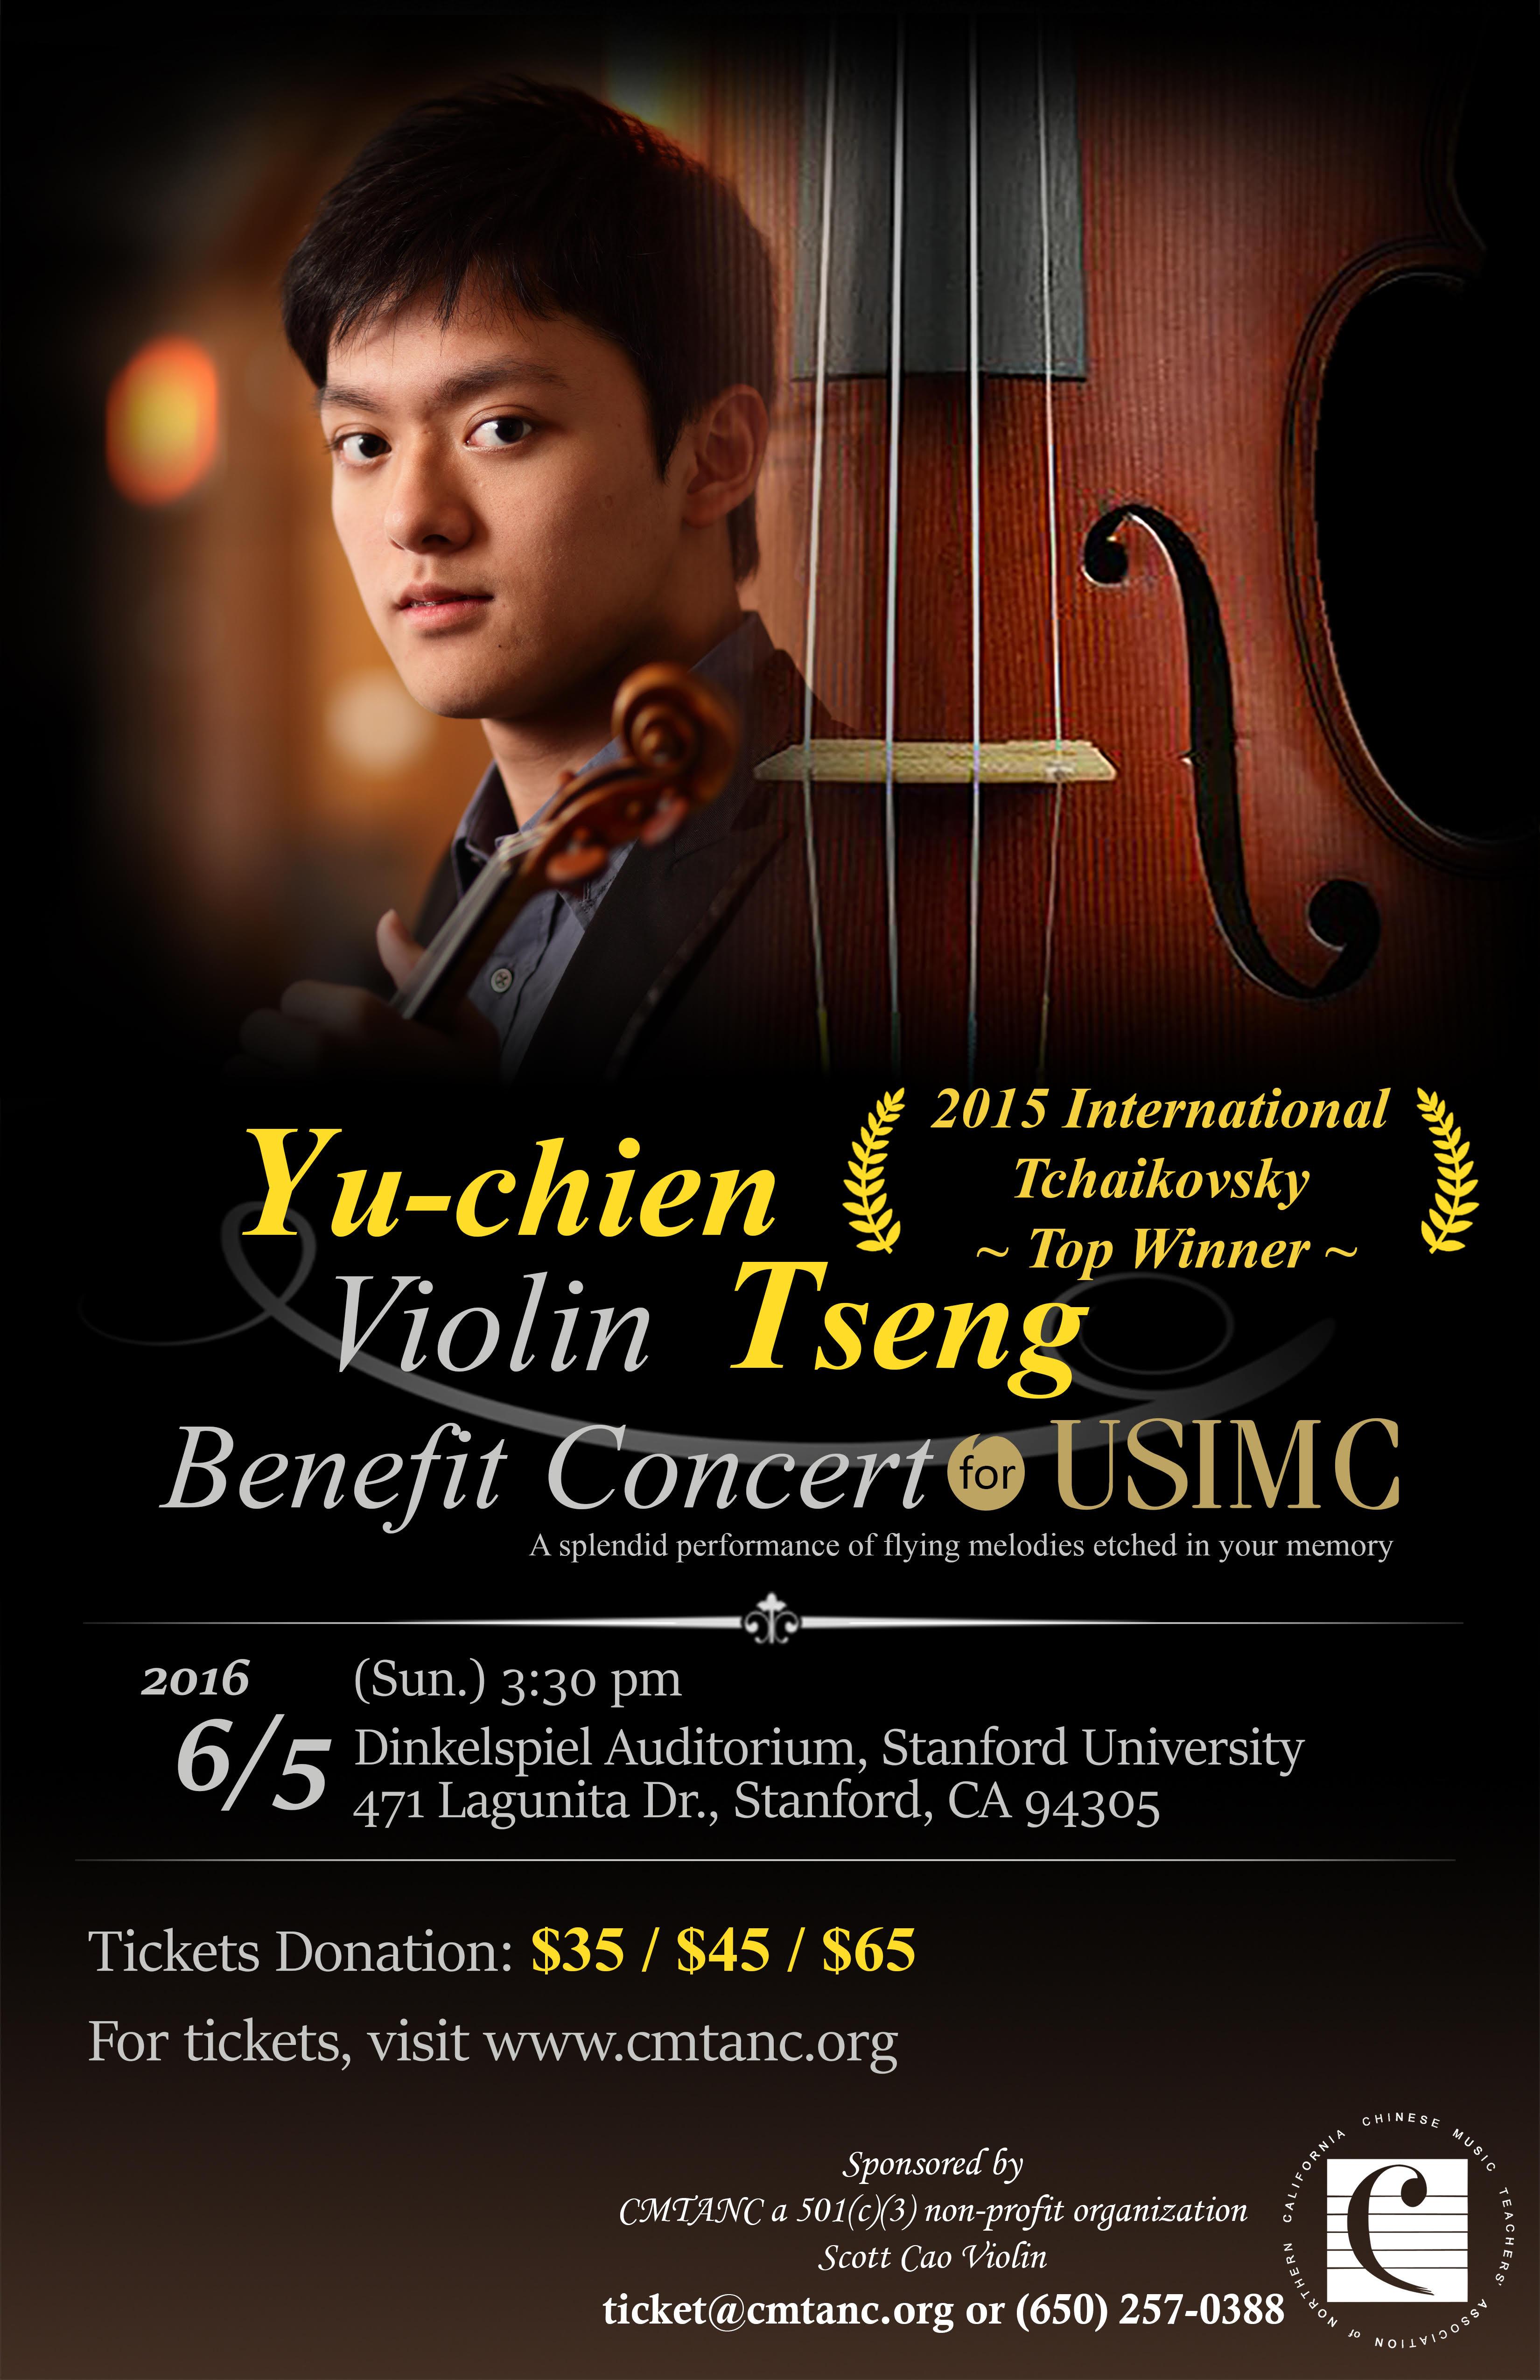 Yu Chien Tseng Violin Benefit Concert For The USIMC Jun 05 16